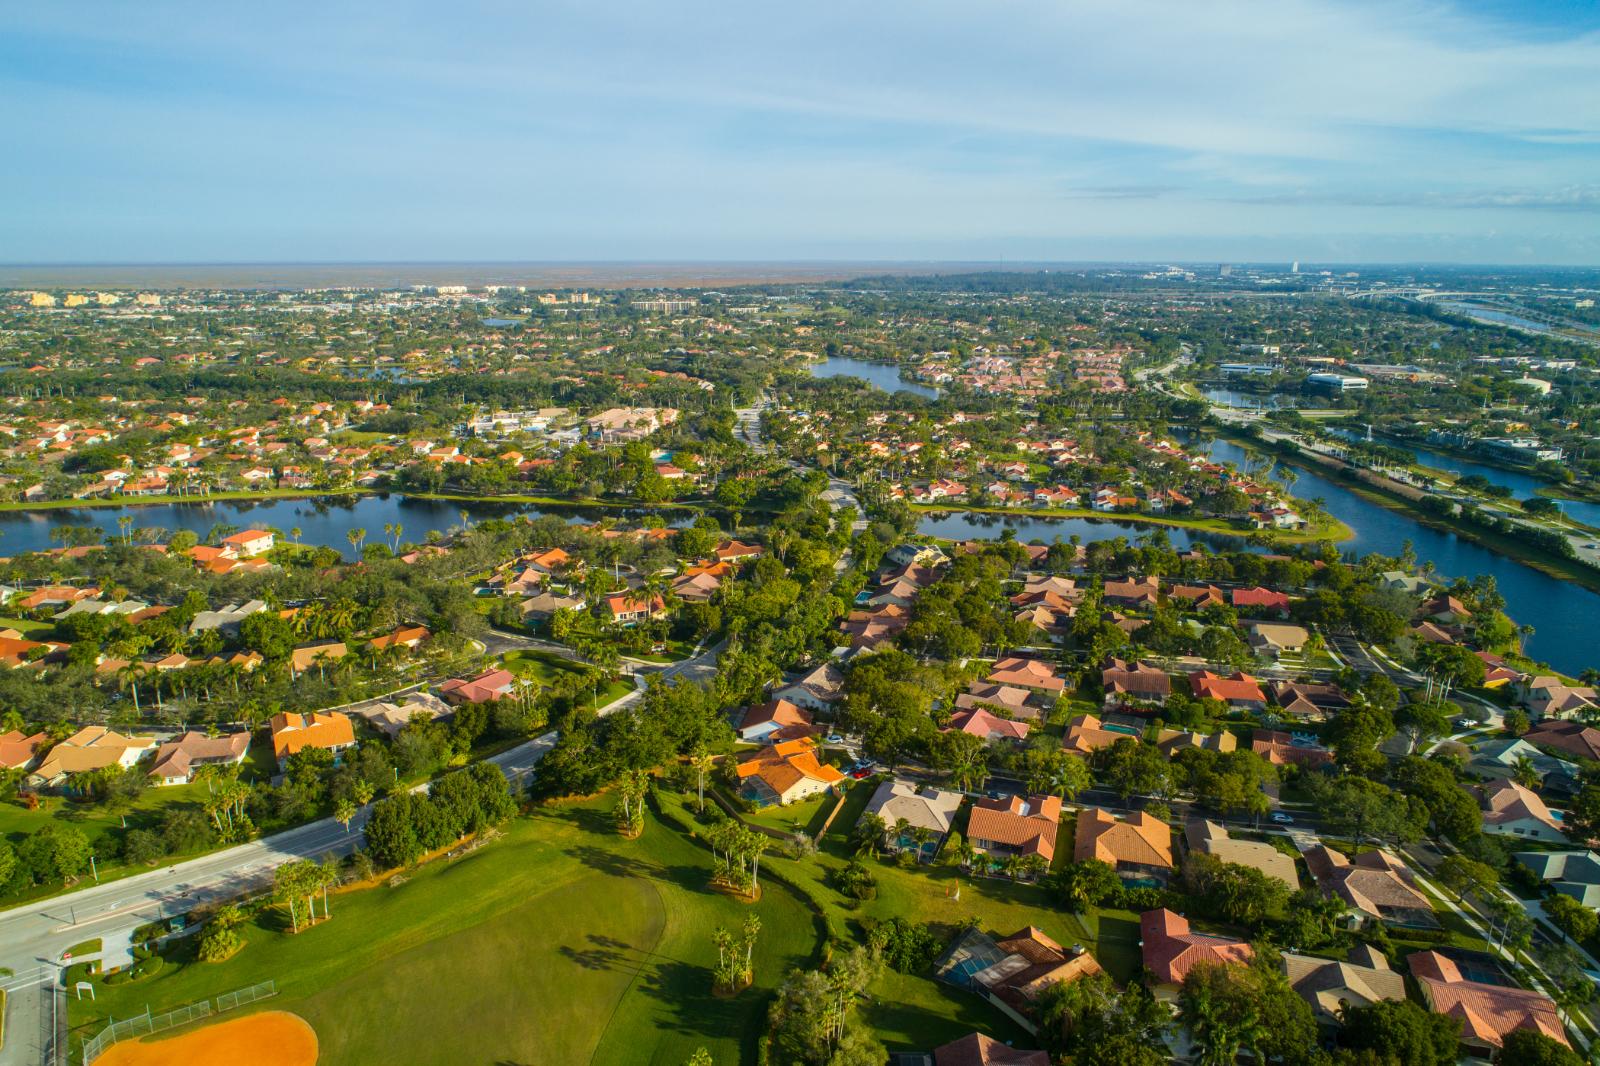 The Best Neighborhoods To Live In Weston Florida